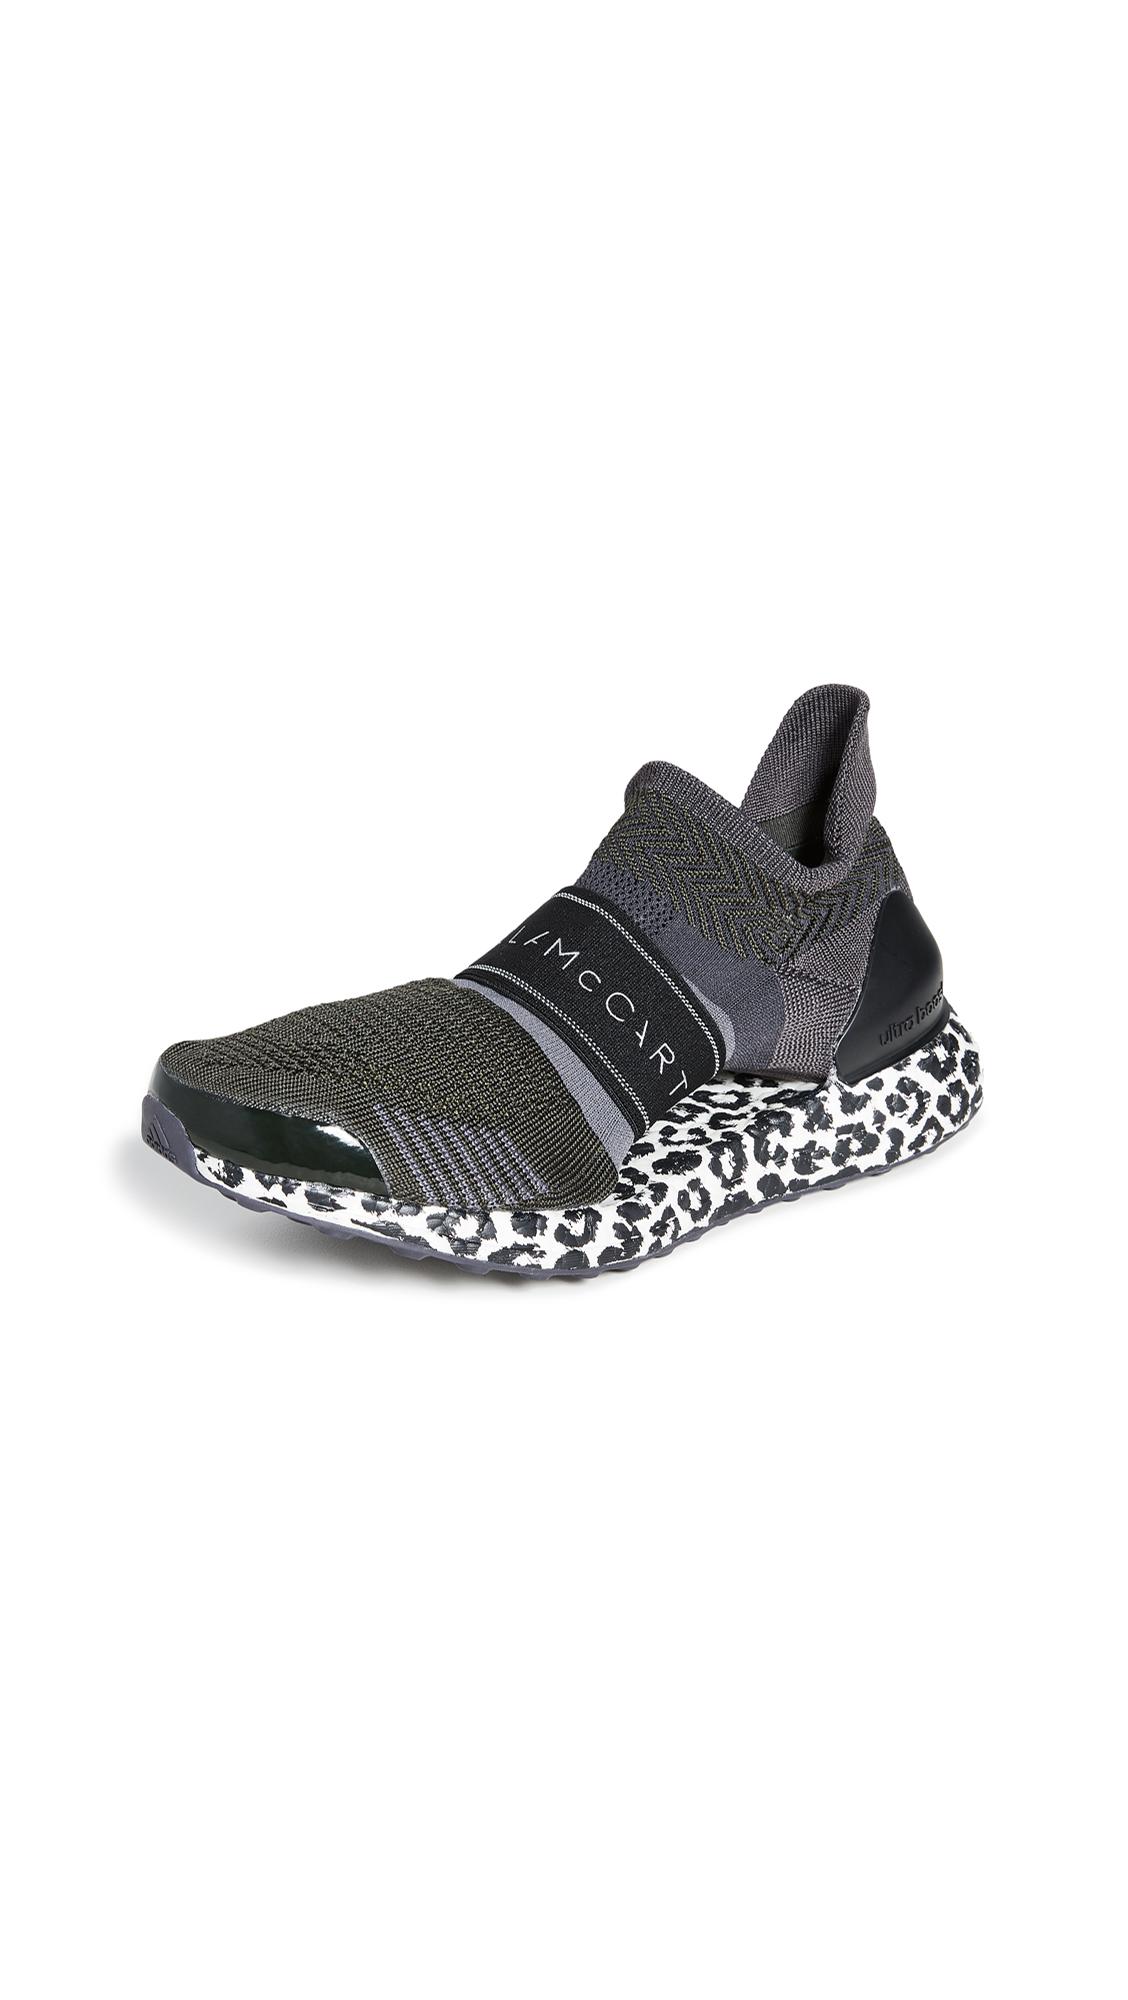 Buy adidas by Stella McCartney online - photo of adidas by Stella McCartney UltraBOOST X 3D Sneakers